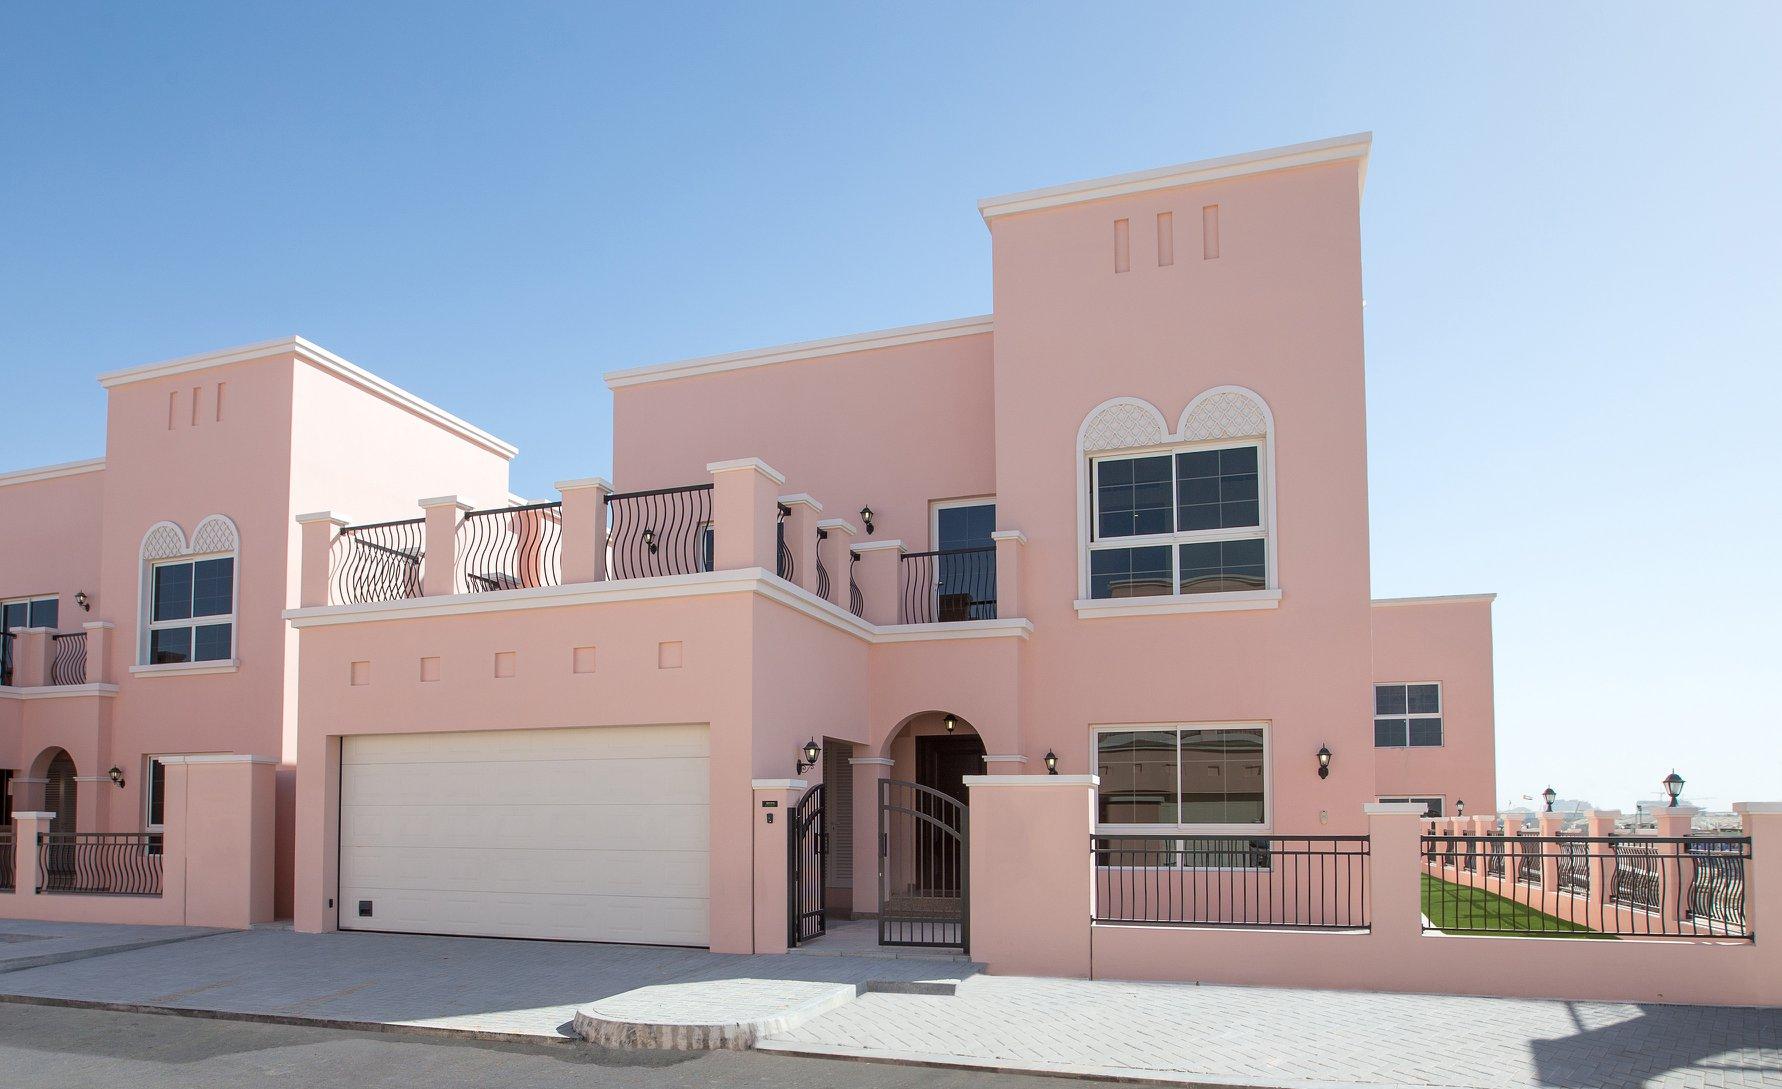 4-bedrooms-villas-for-sale-in-ned-al-sheba